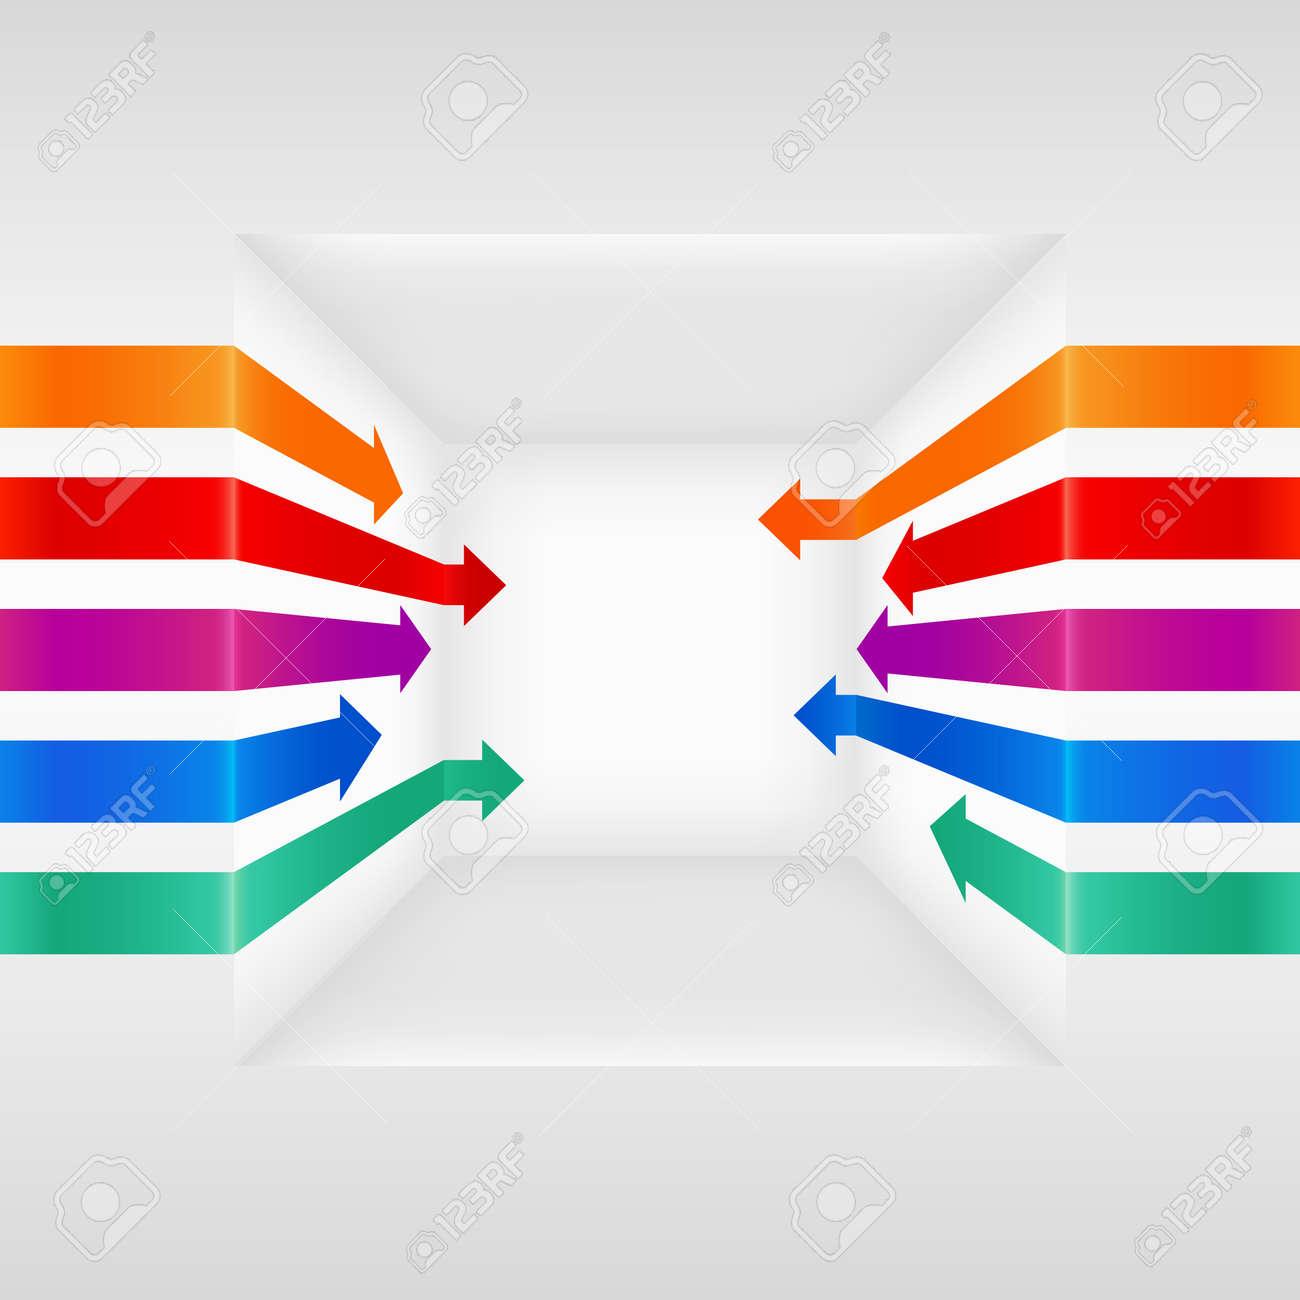 Colorful 3d vector arrows - 15219345